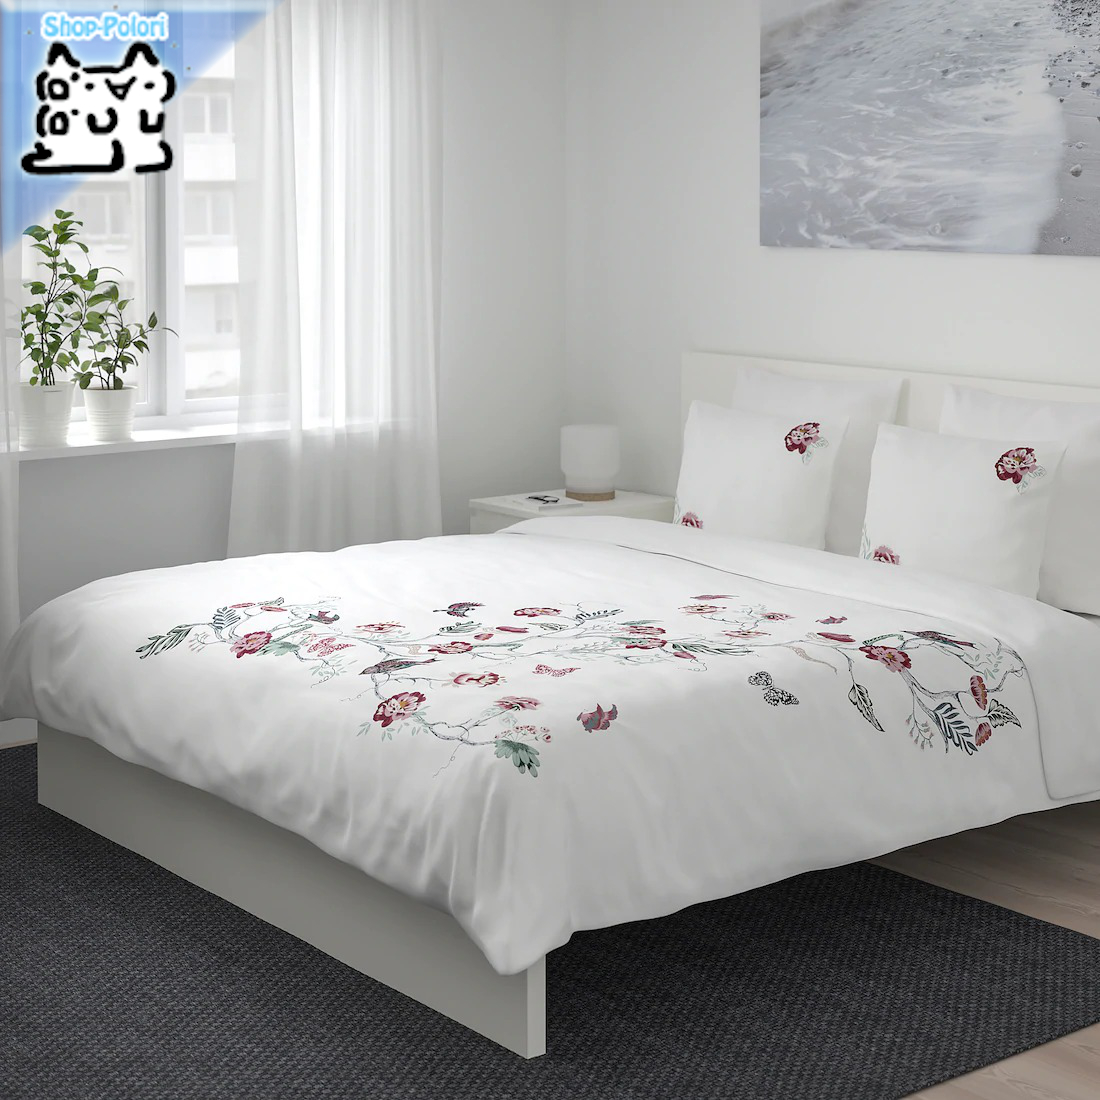 【IKEA Original】JATTELILJA 掛け布団カバー&枕カバー(枕カバー2枚) ホワイト フローラルパターン 200x200/50x60 cm